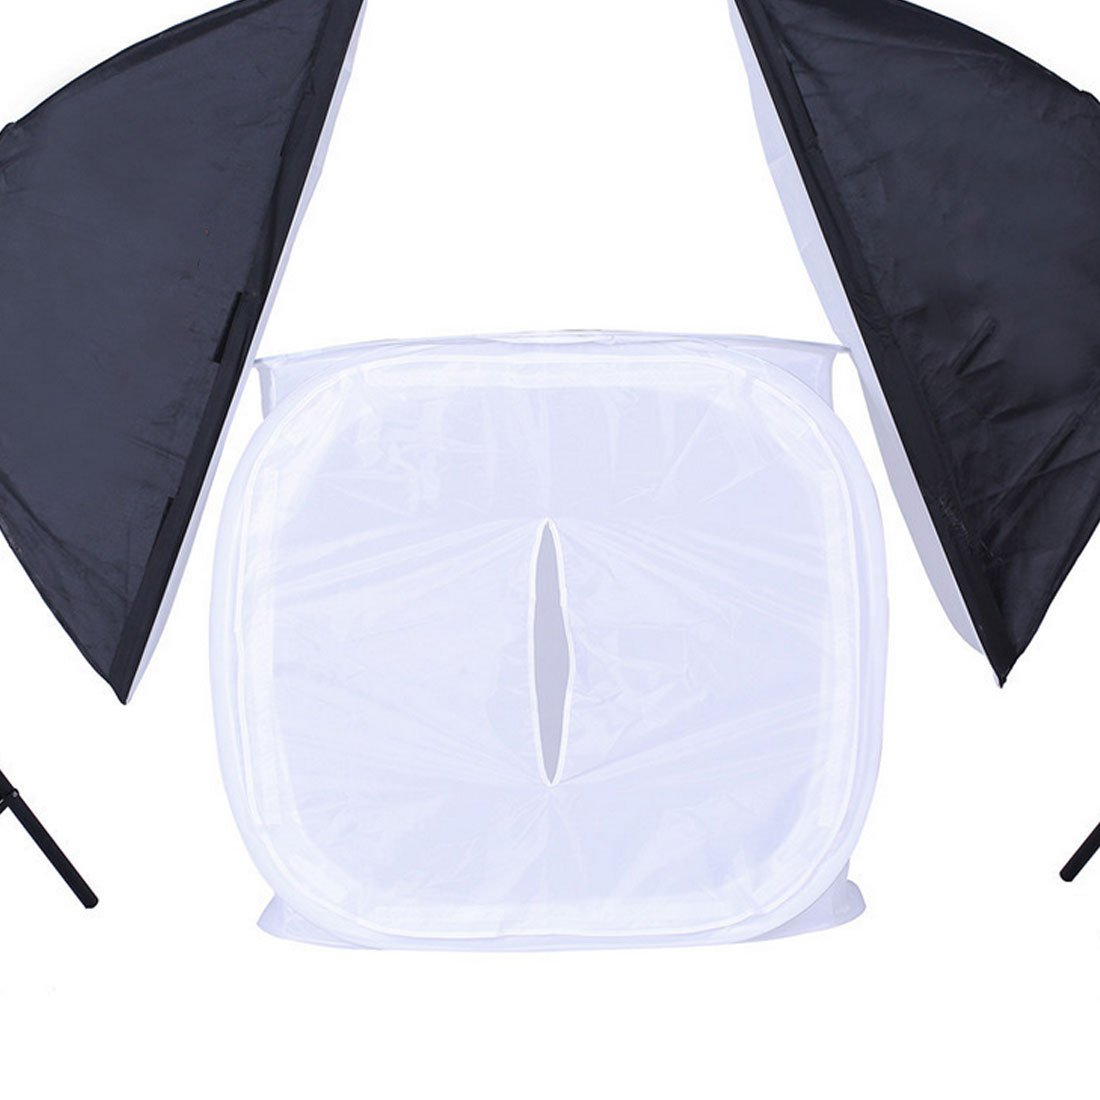 LILIERS Photo Studio Soft Box Shooting Tent Softbox Cube Box,60 x 60cm//Photo Light Tent+Portable Bag 4 Backdrops